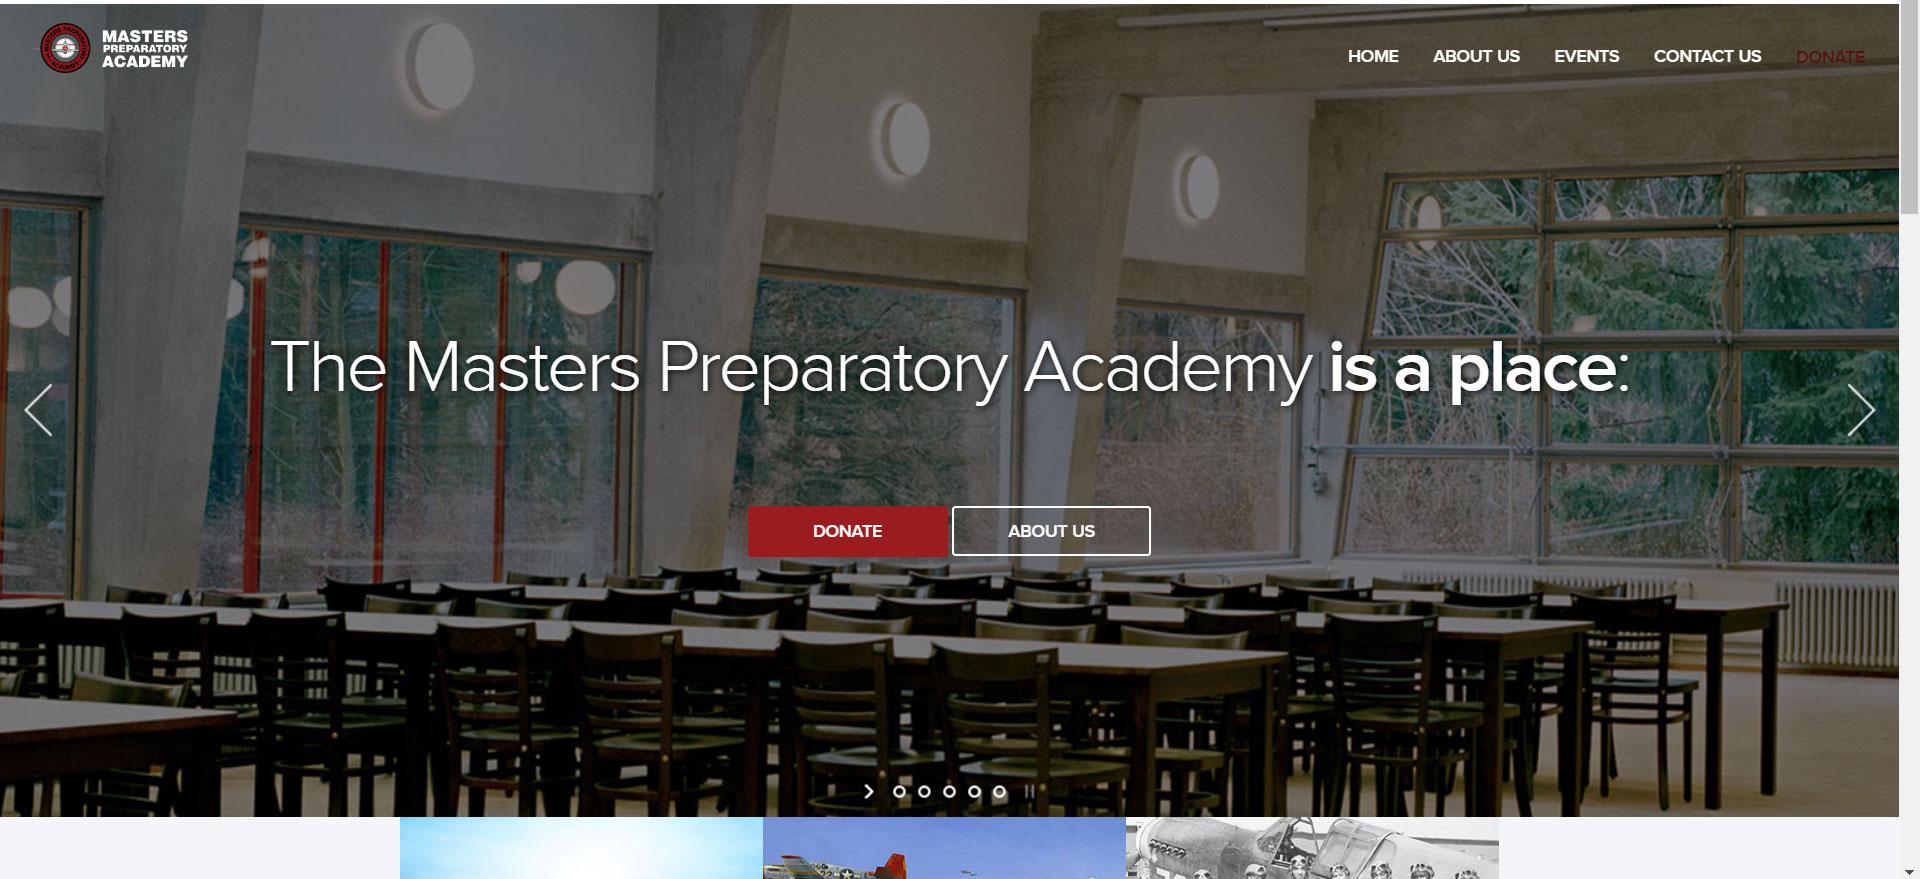 The Masters Preparatory Academy website